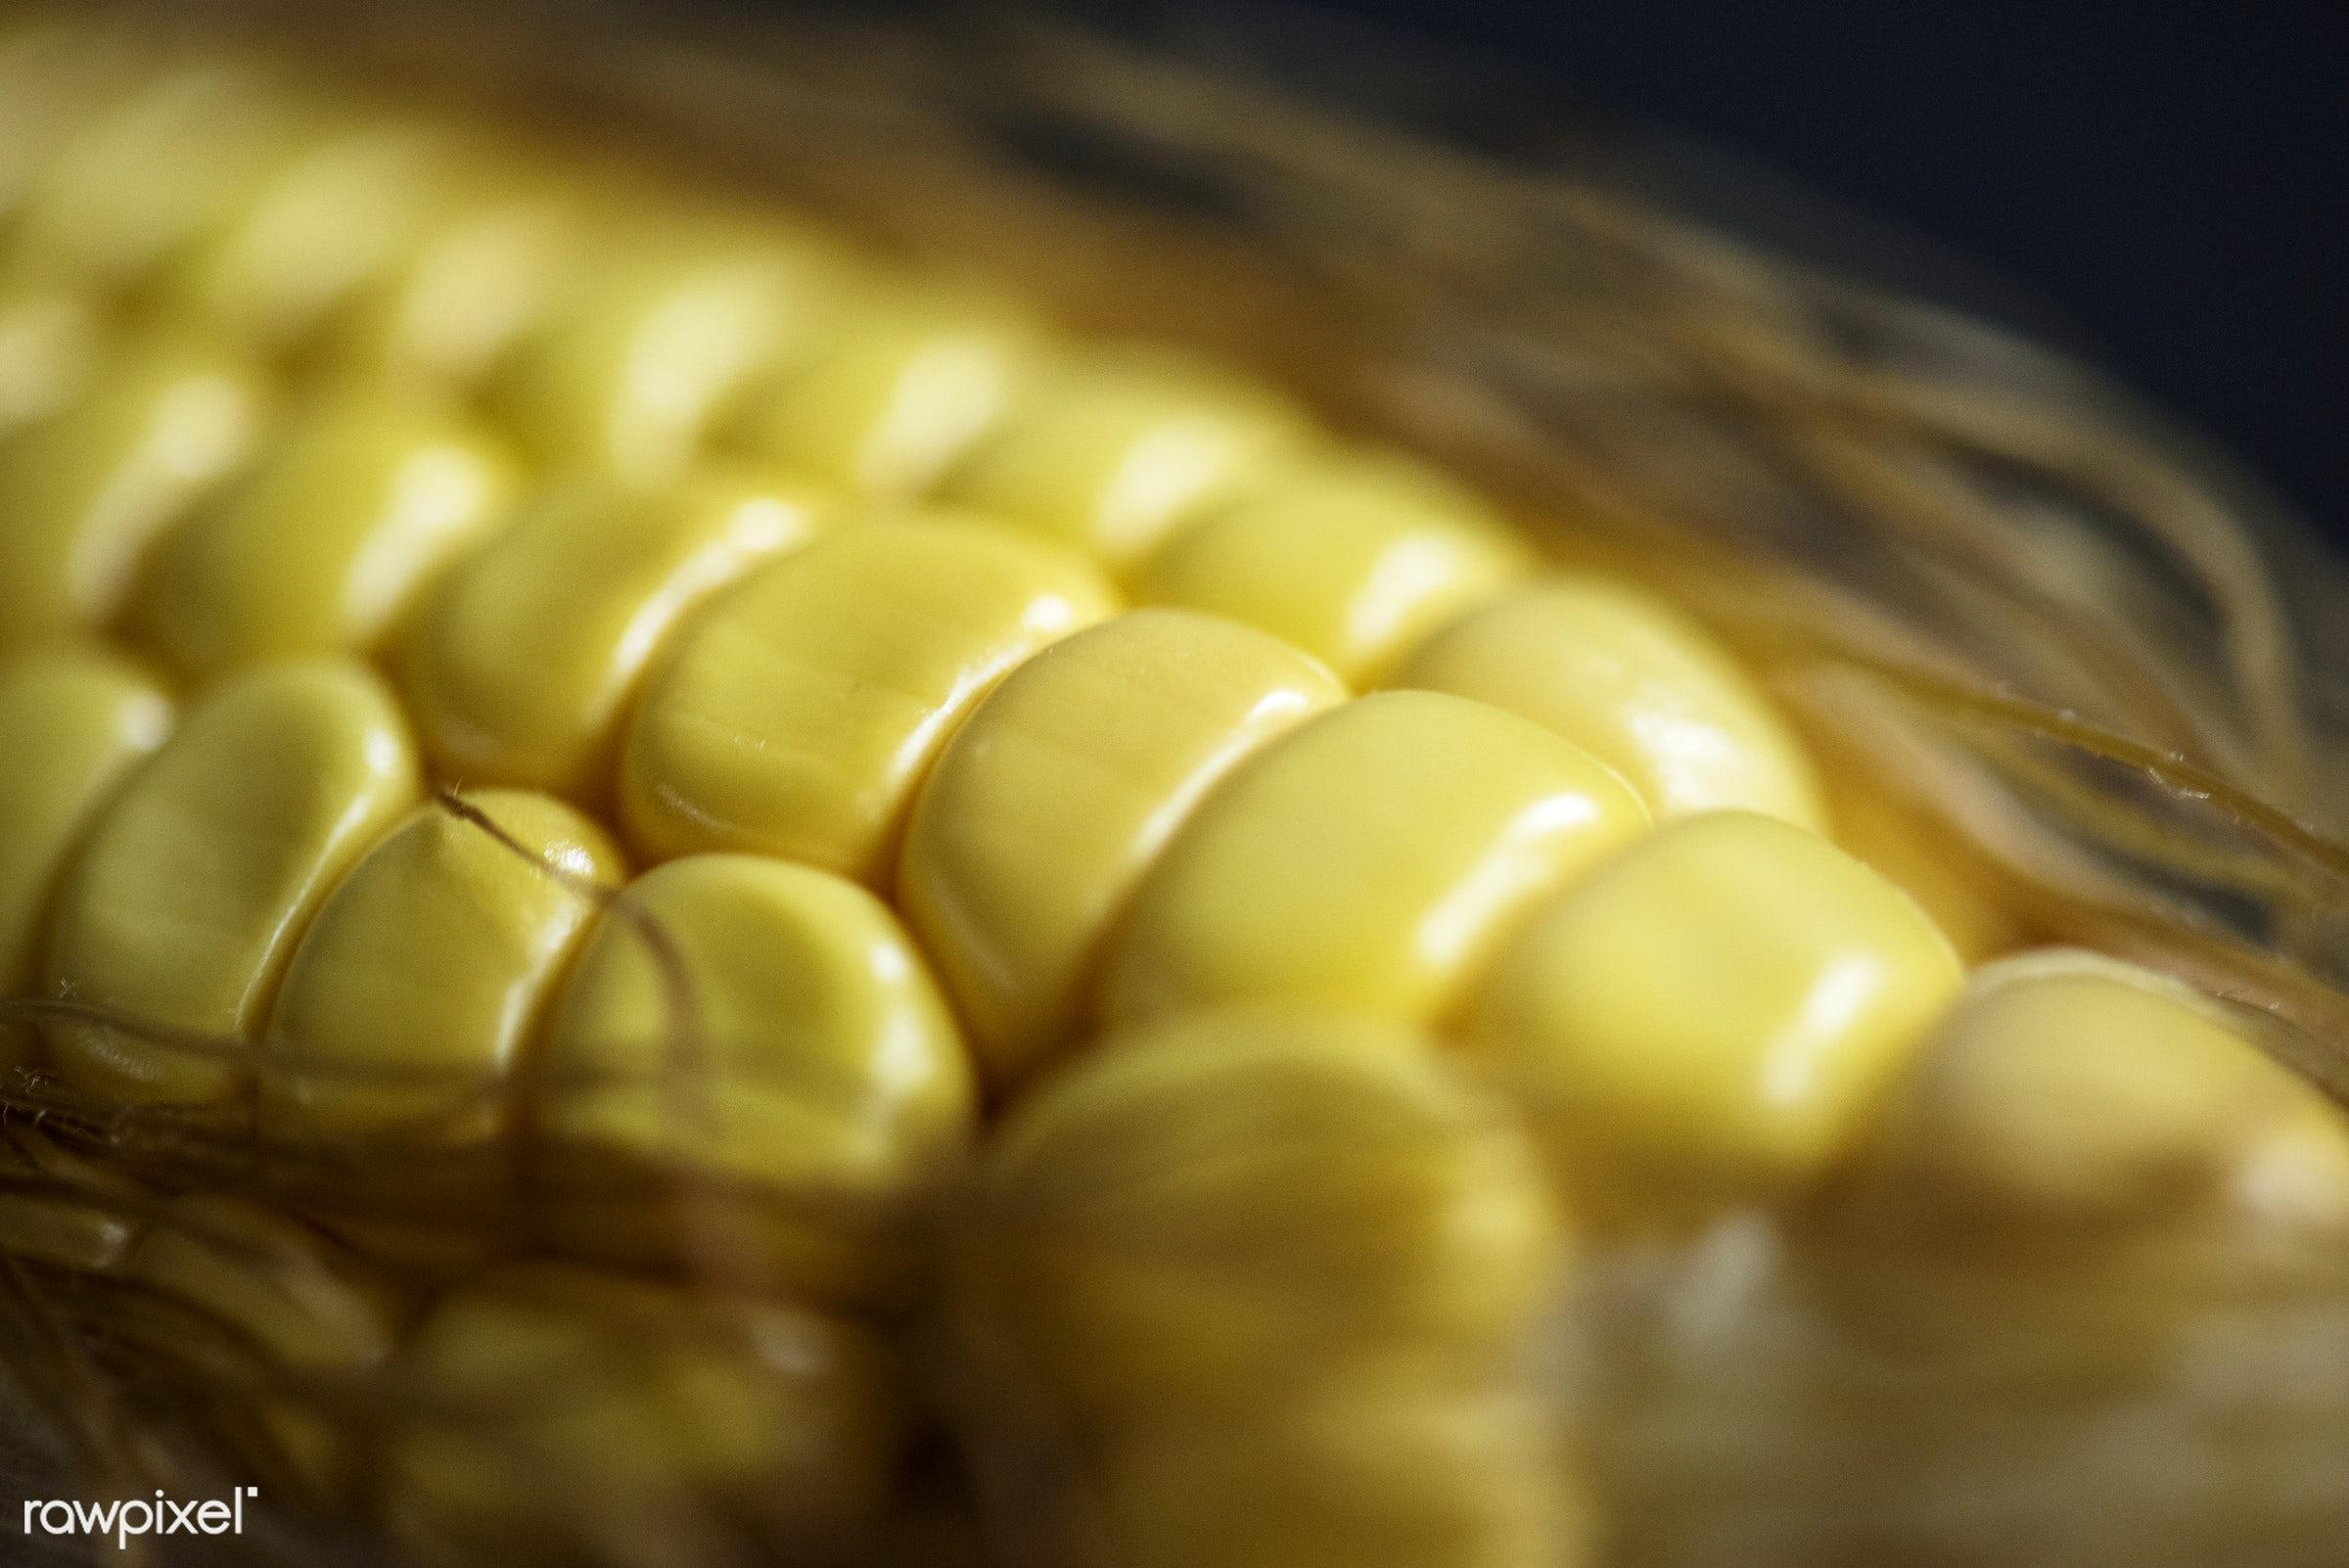 Macro shot of corn stalk - raw, plant, maize, yellow, corn, organic, nature, ripe, stalk, harvest, closeup, vegetable, macro